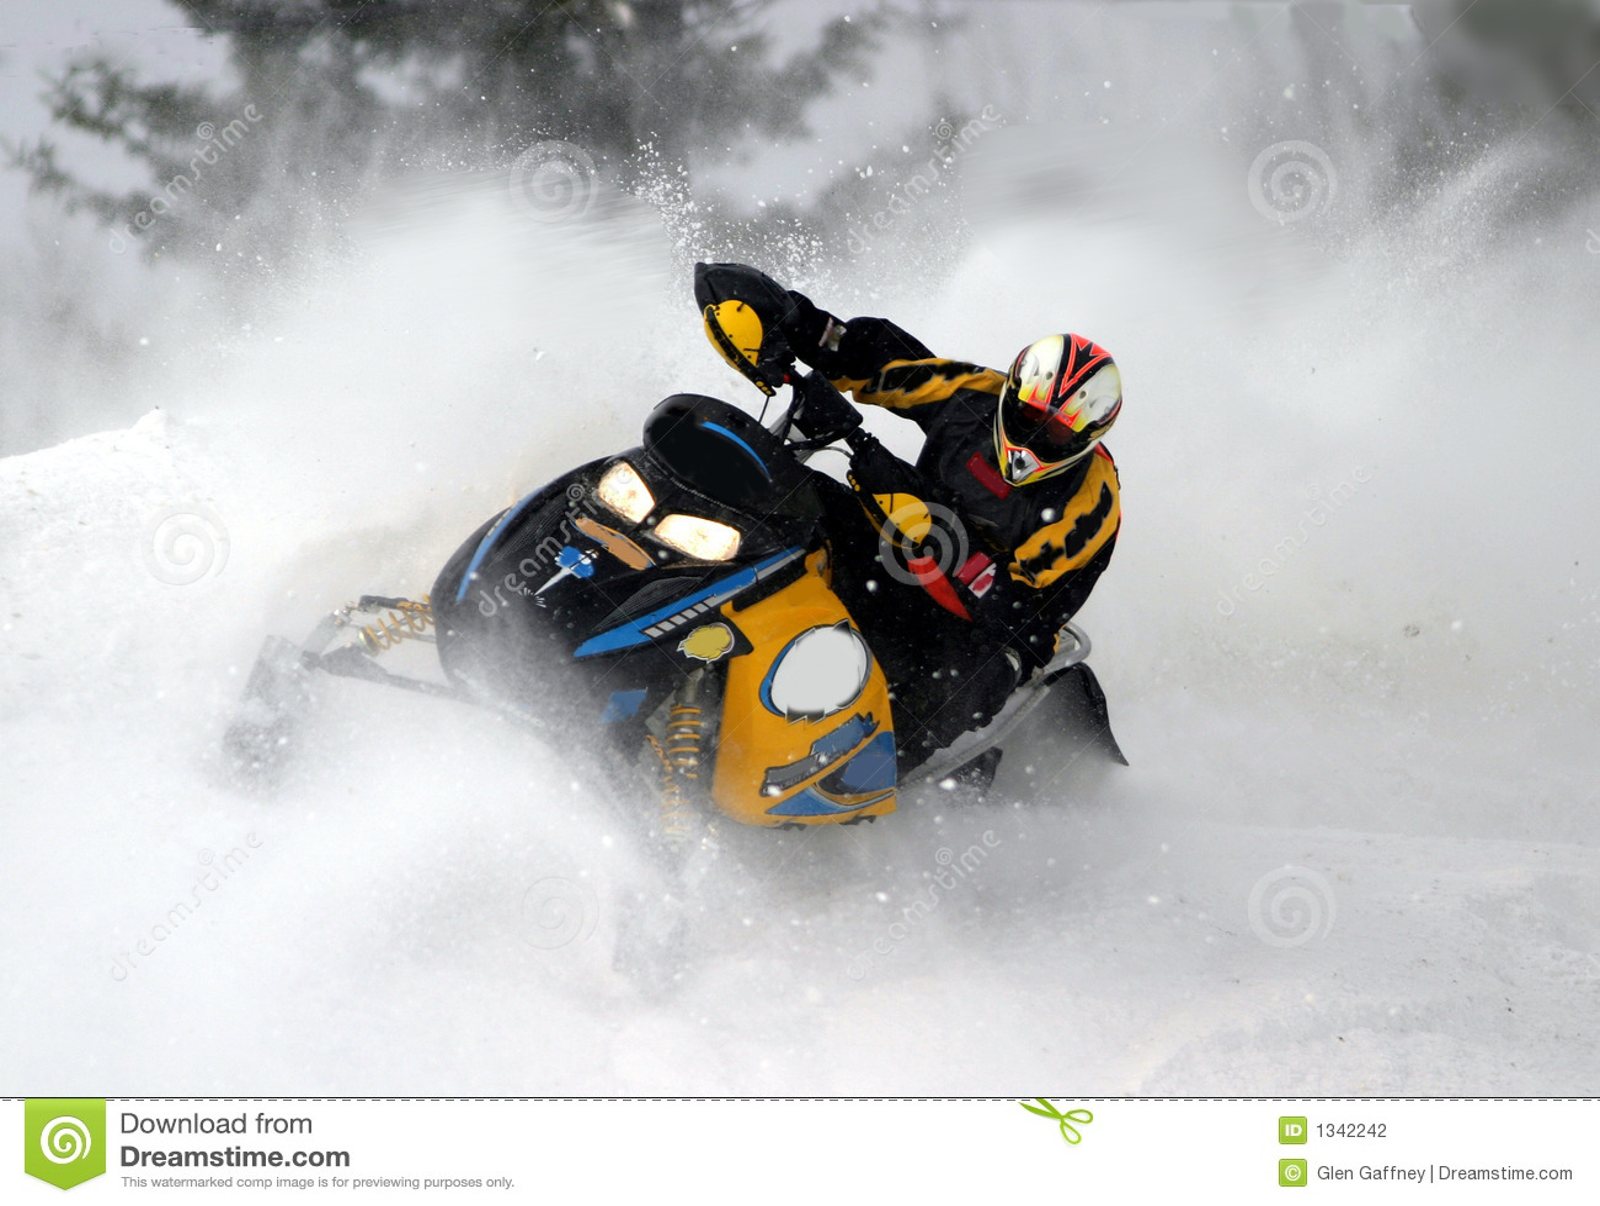 Snowmobile action shot